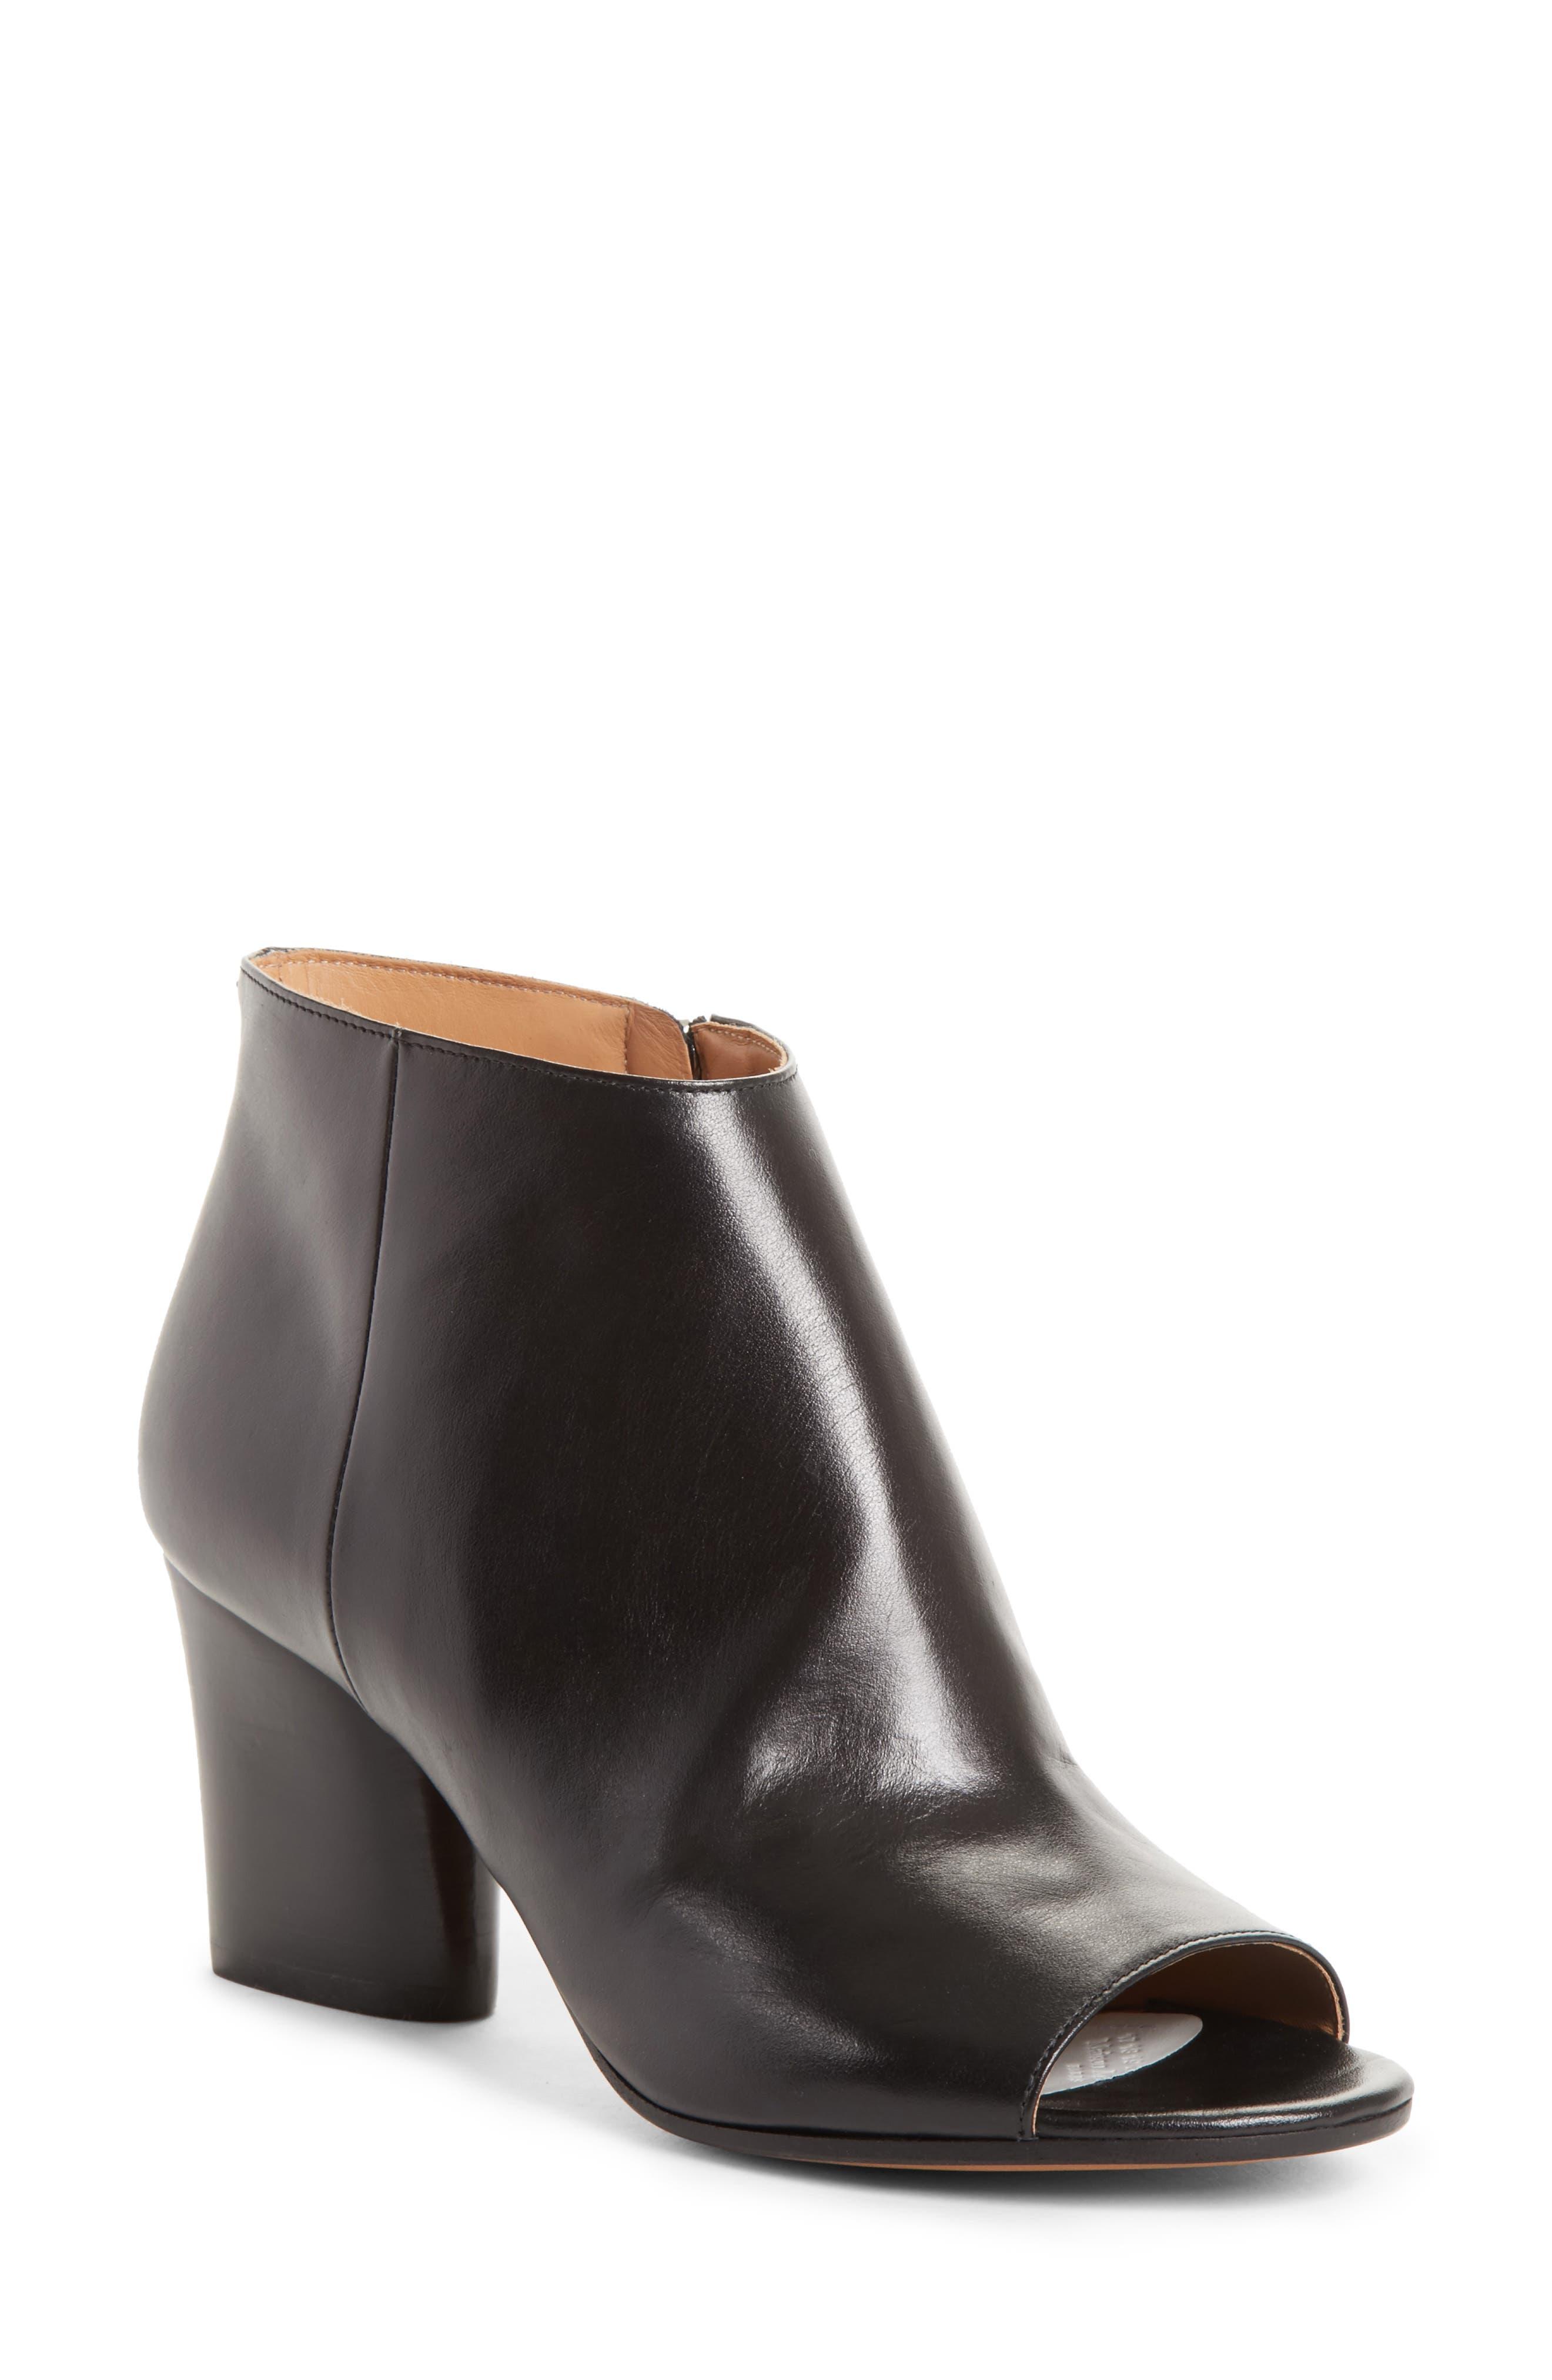 Main Image - Maison Margiela Open Toe Ankle Boot (Women)